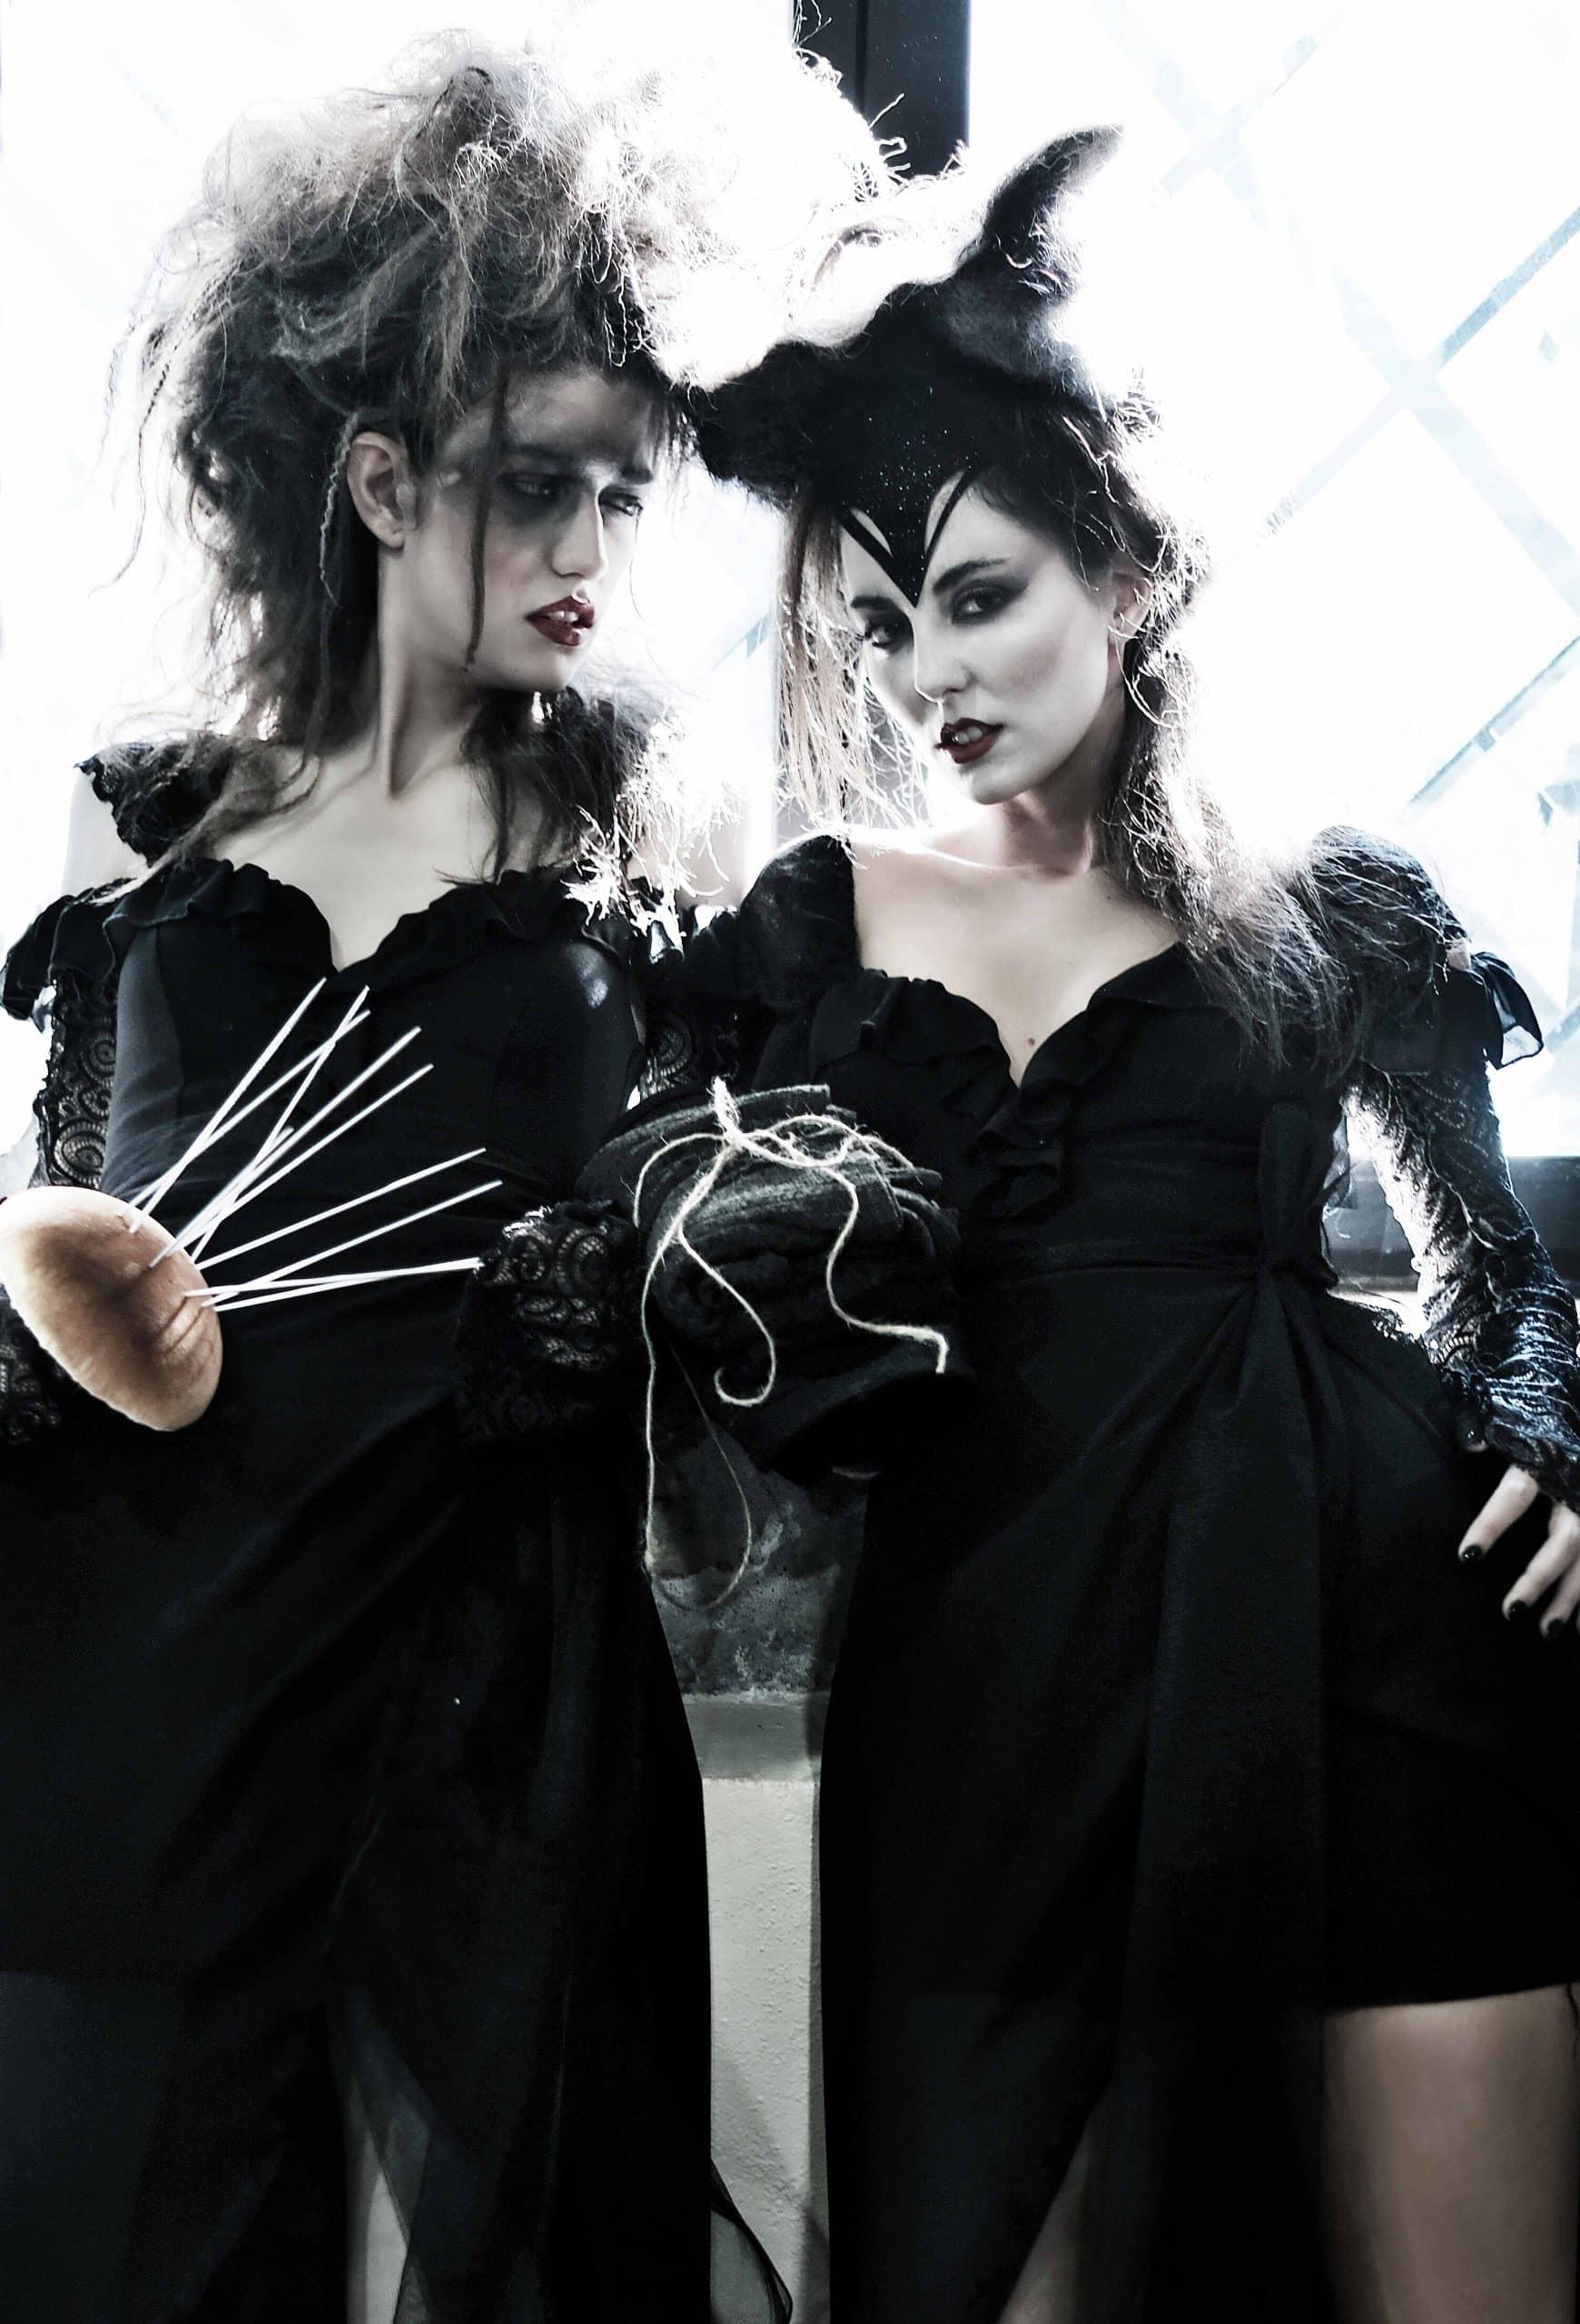 Yolanda Aberasturi Halloween 4 scaled